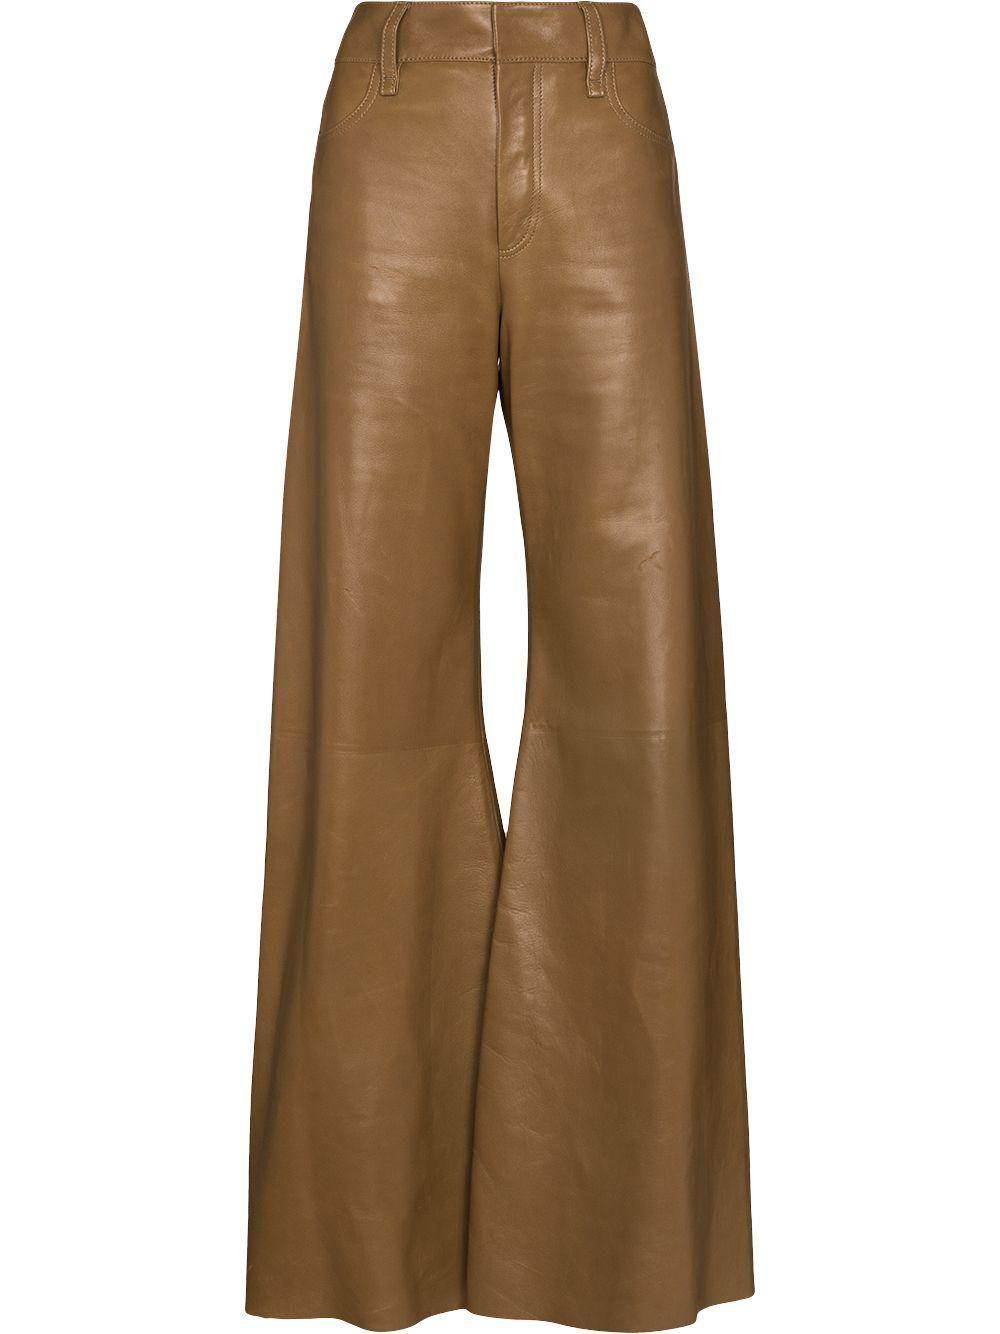 chloe wide leg leather trousers